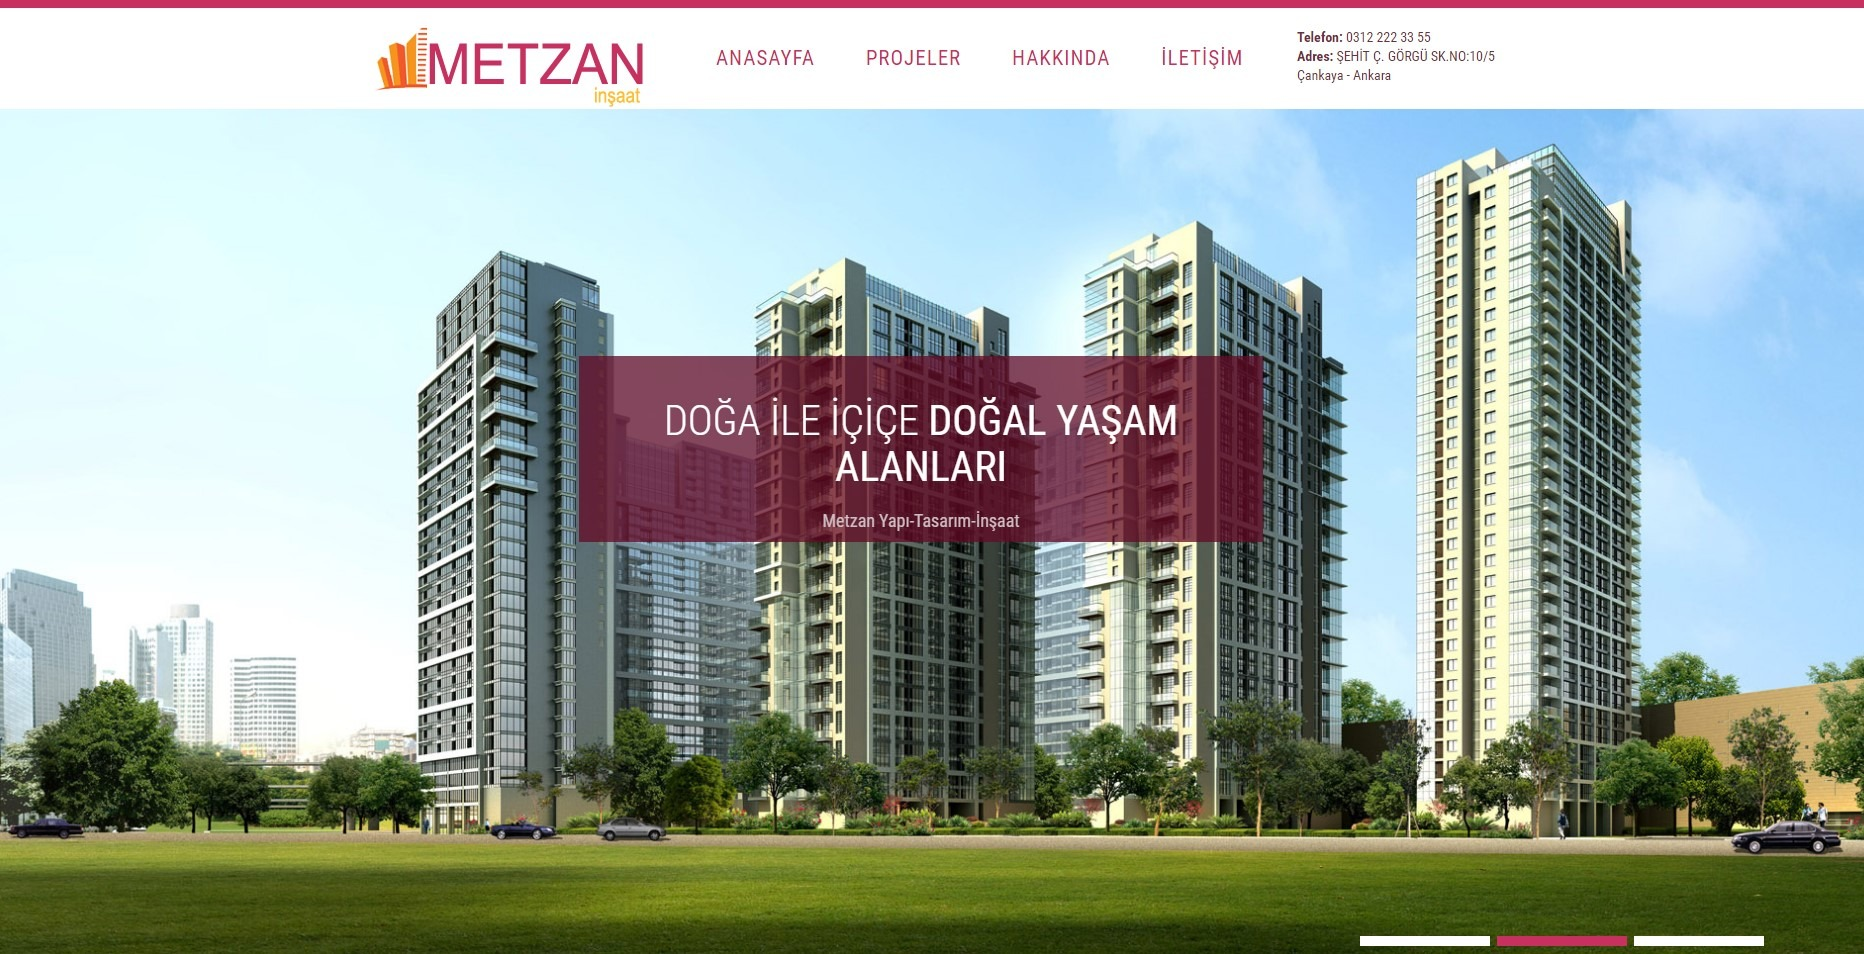 metzancom